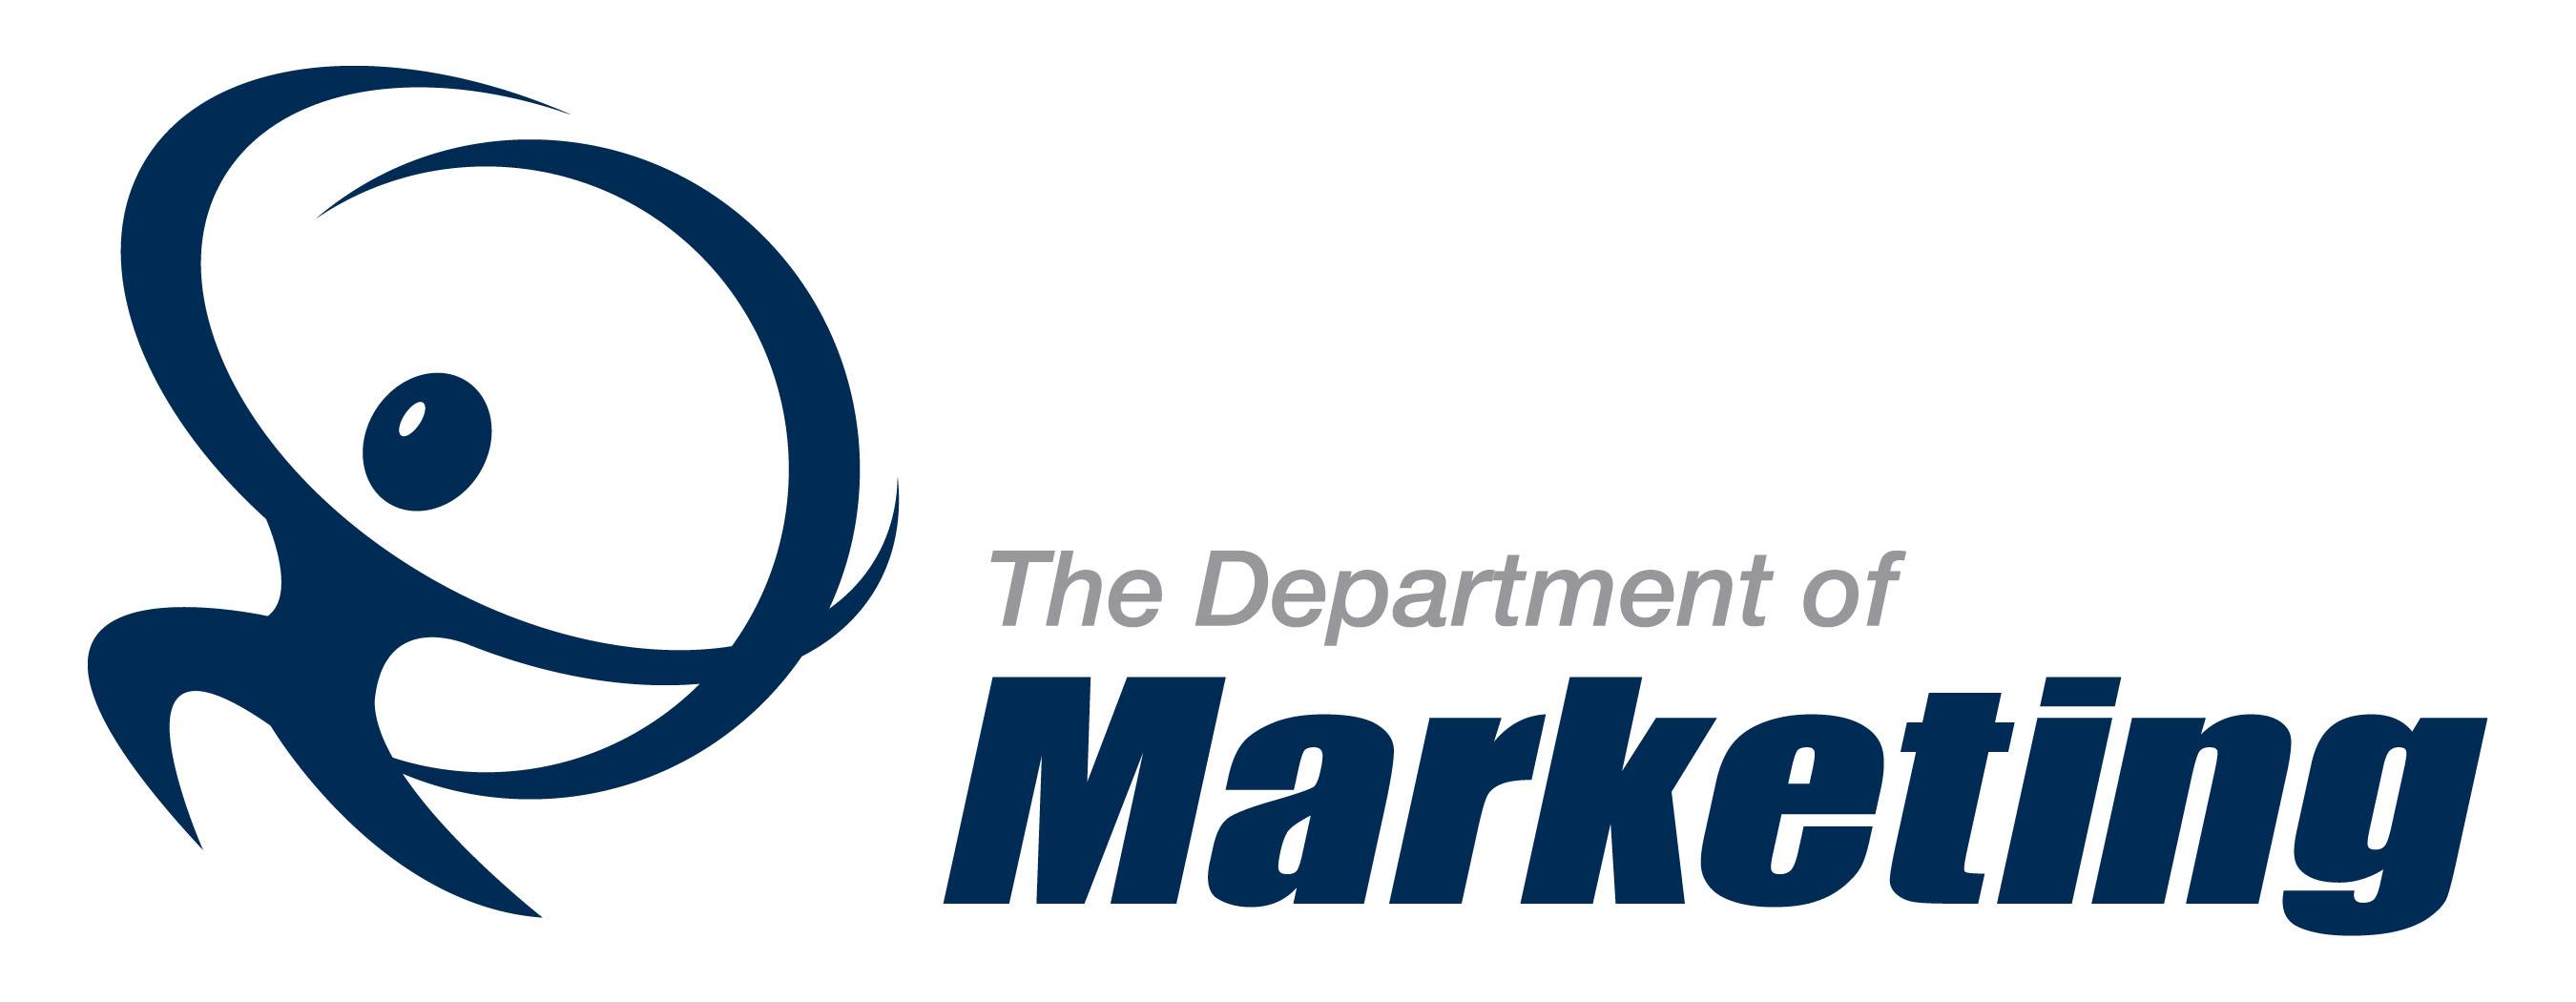 Marketing Firm Logos | www.imgkid.com - The Image Kid Has It!